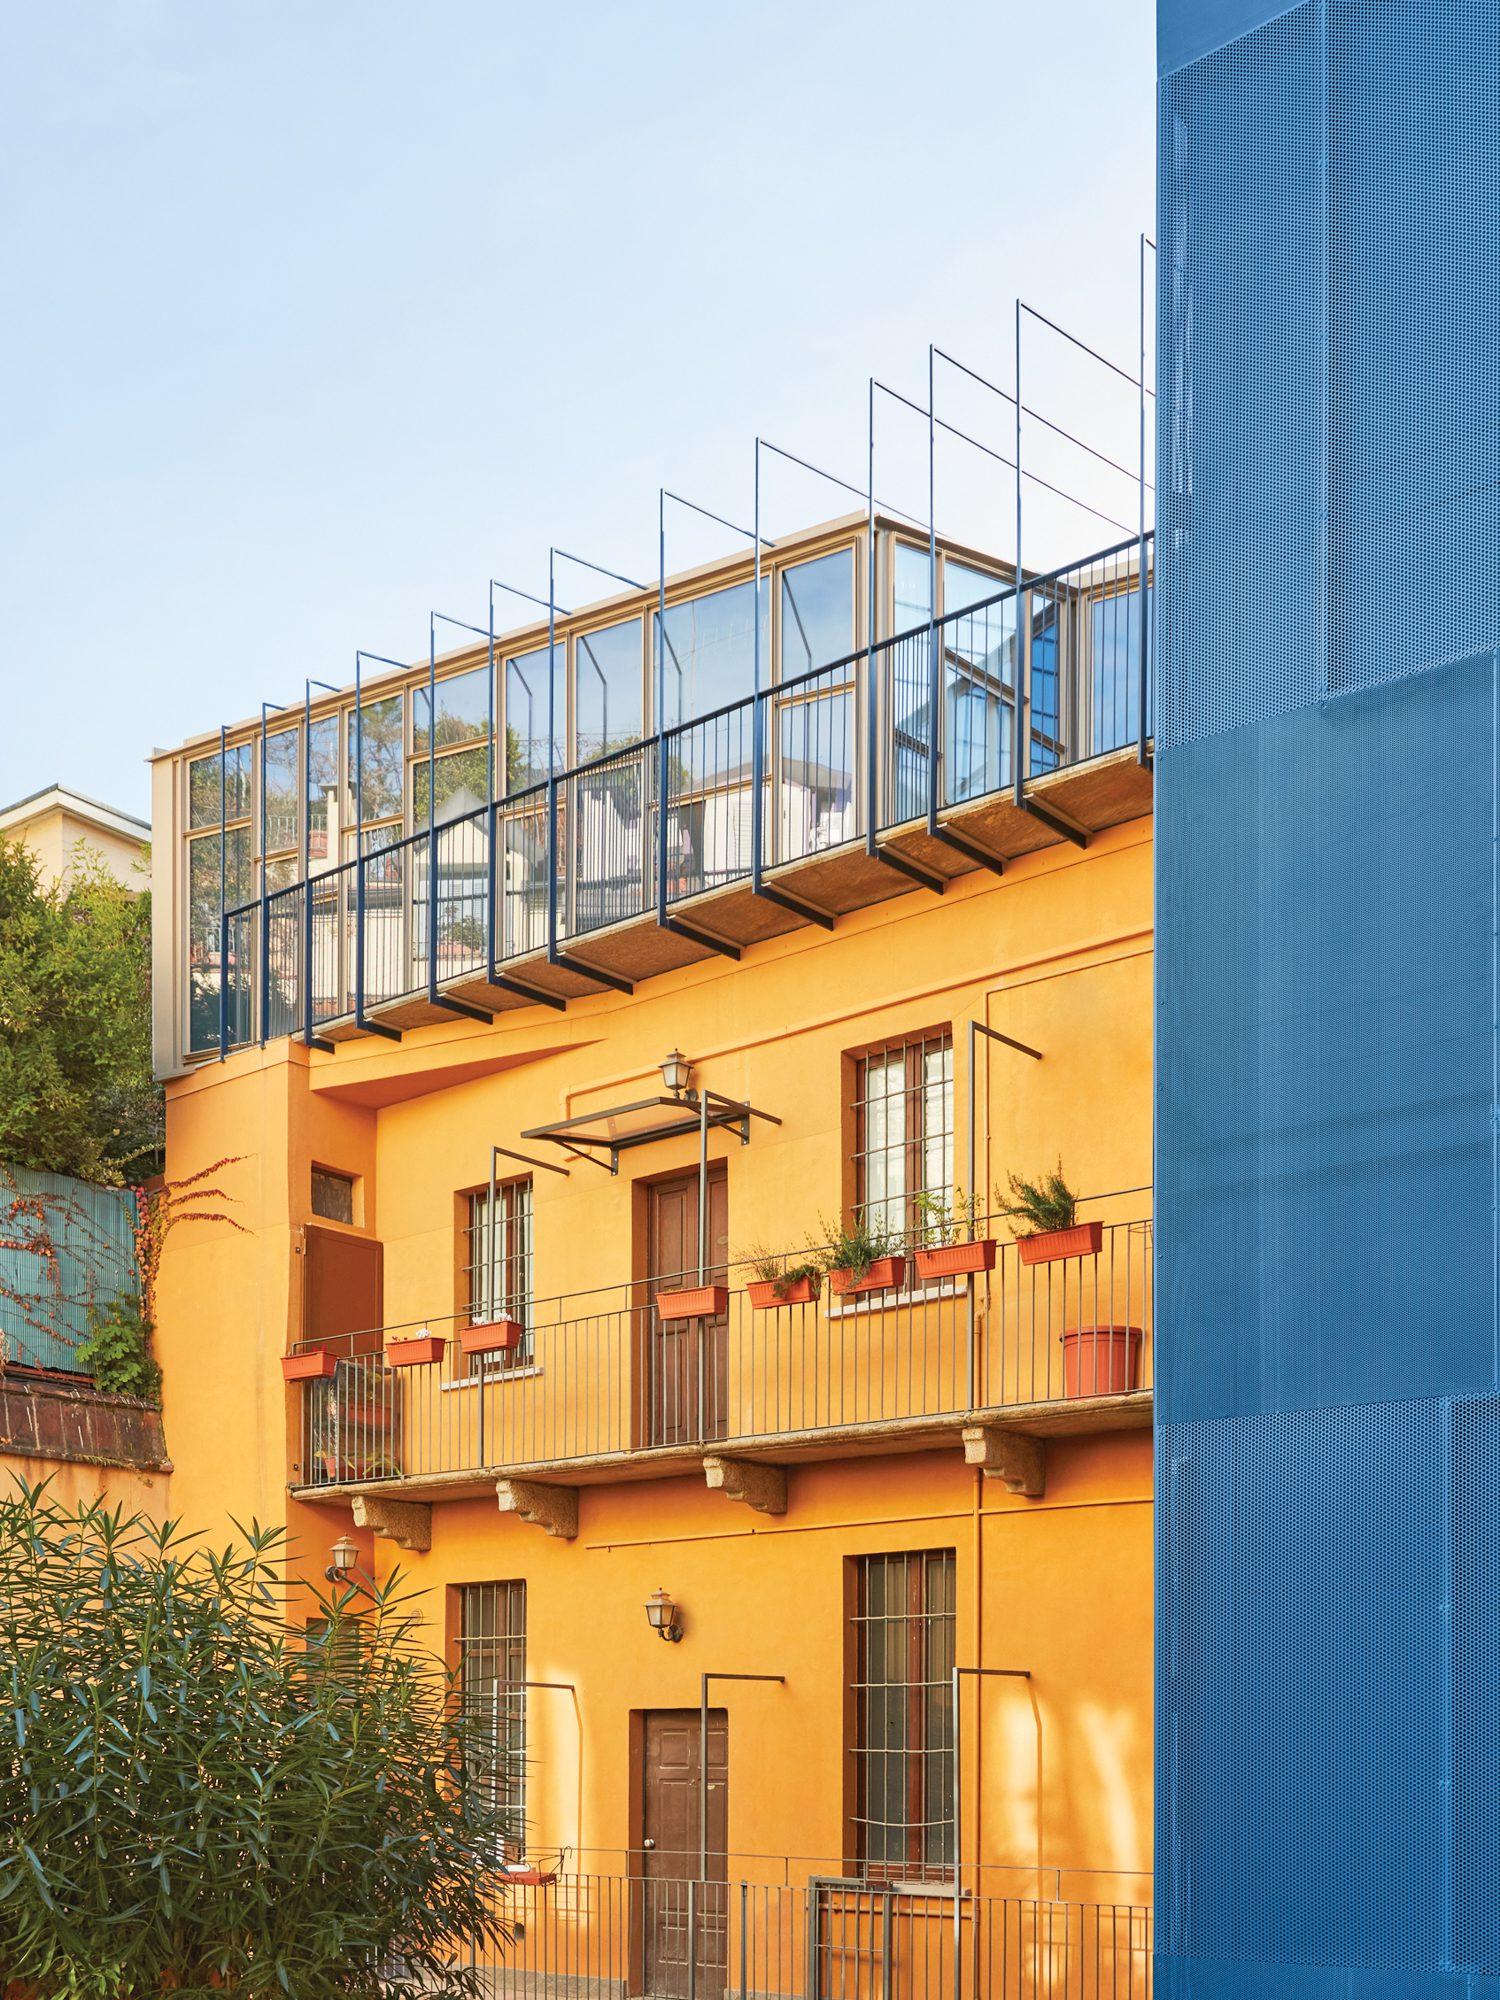 Milan home by Itch Società d'Architettura.